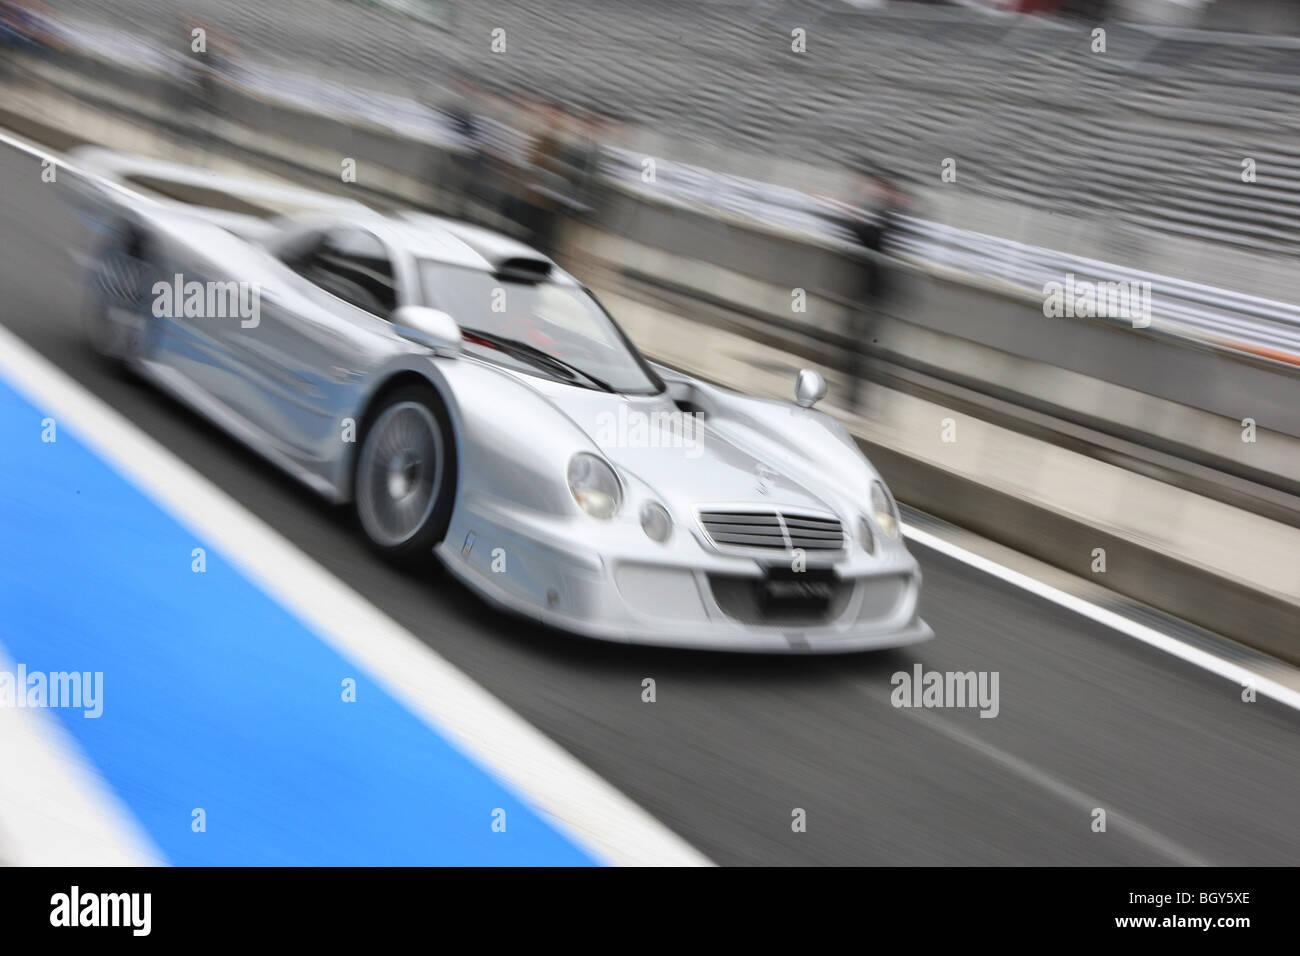 Mercedes Car Track Race Stock Photos & Mercedes Car Track Race ...